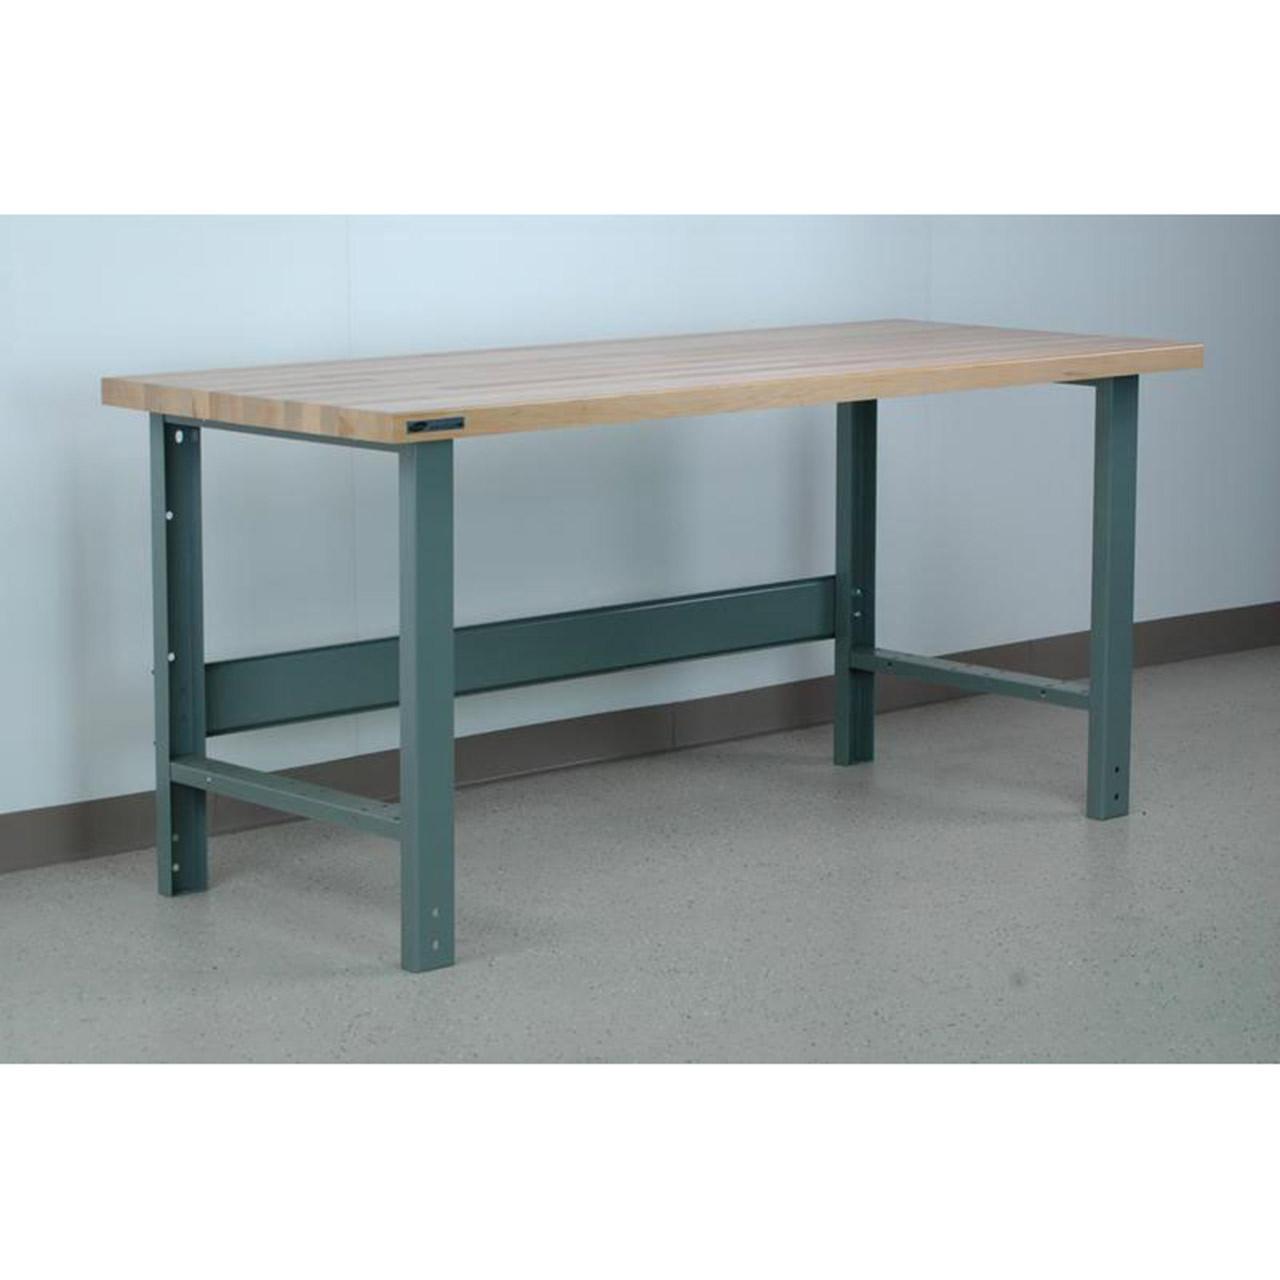 Standard Industrial Workbench Maple